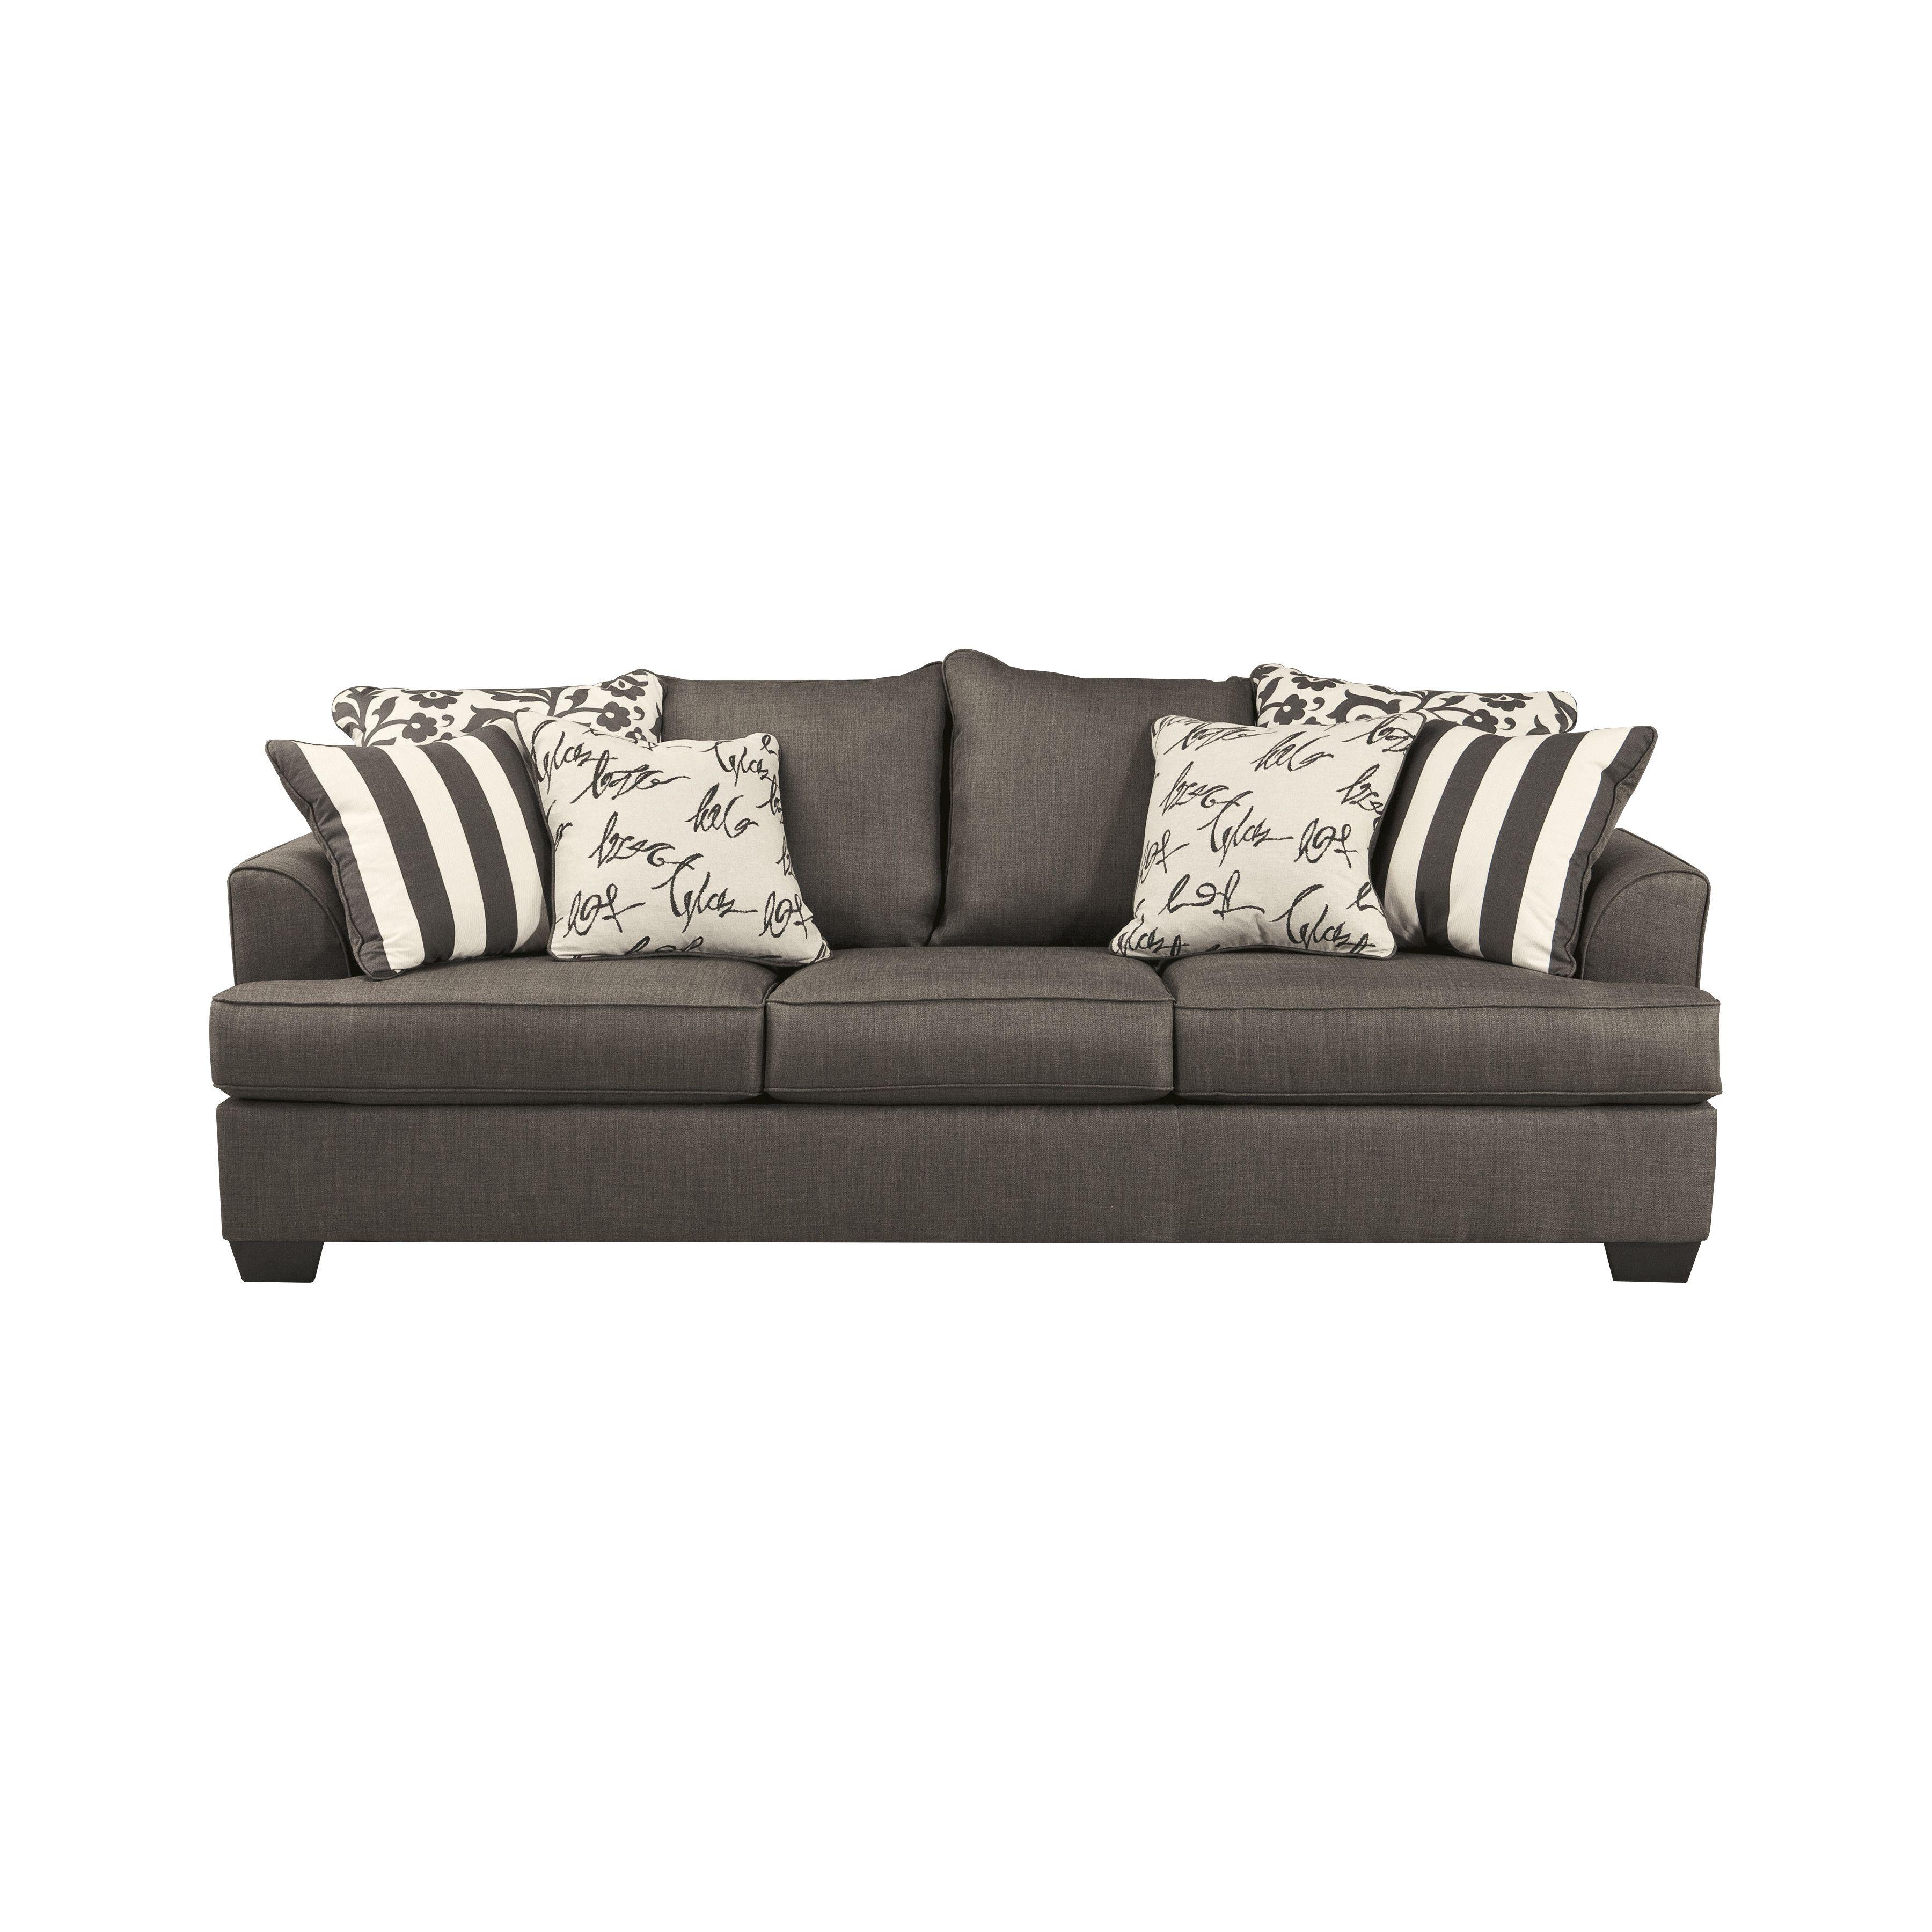 Queen schlafsofa holzkohle sofa bauernmöbel wohnzimmer möbel hände sofa set seat cushions living room sofa room decor